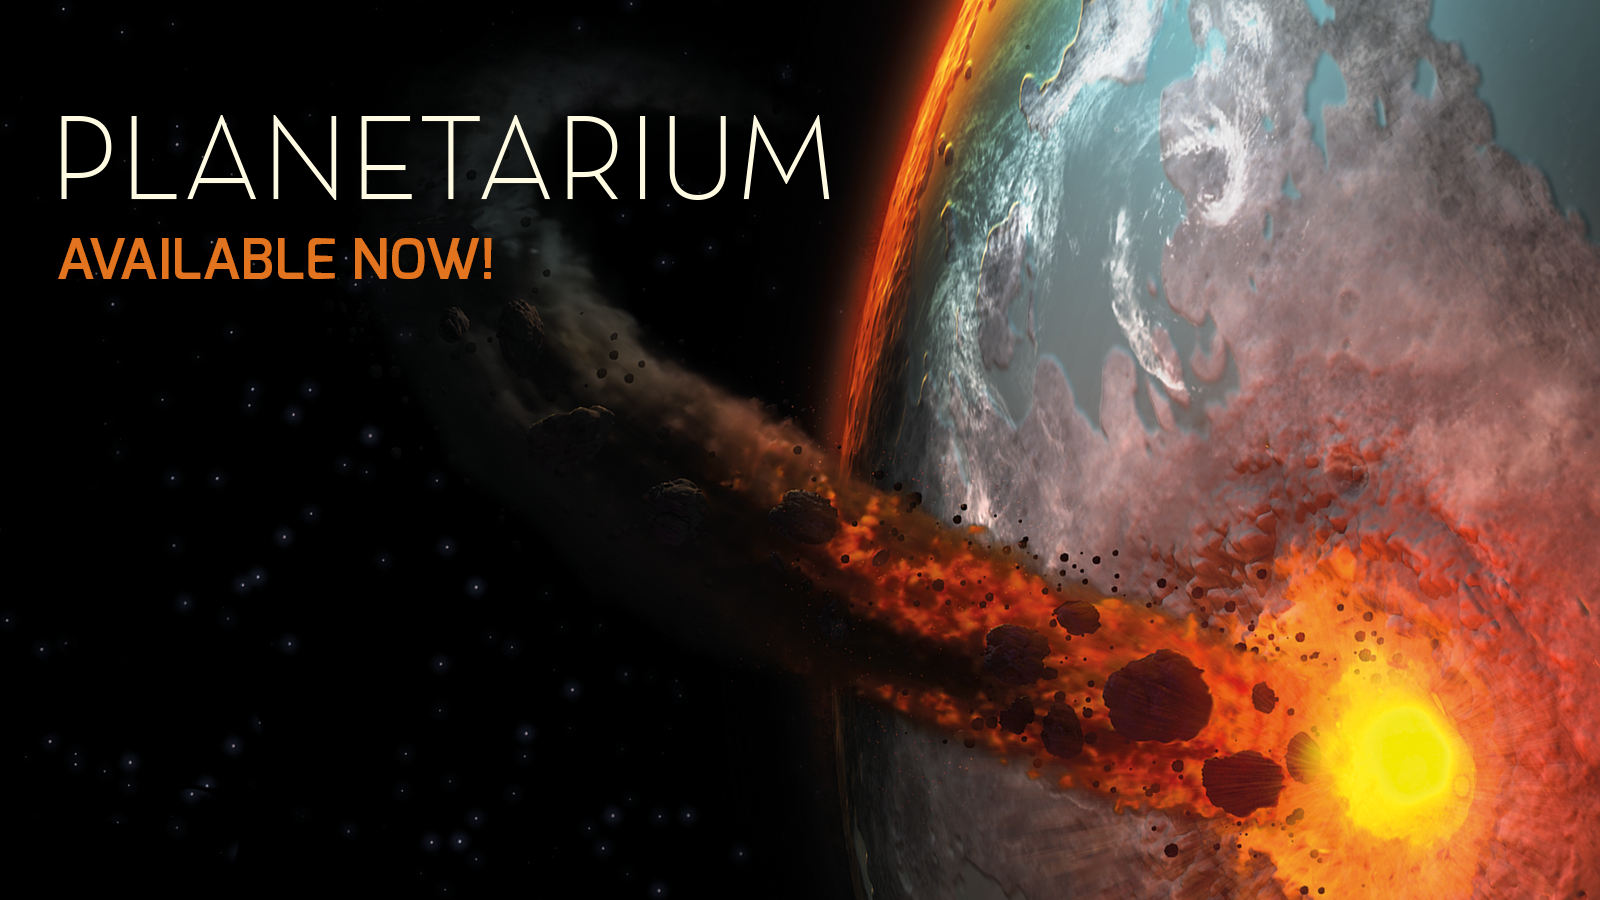 Planetarium_WebsiteBanner_1600x900.png